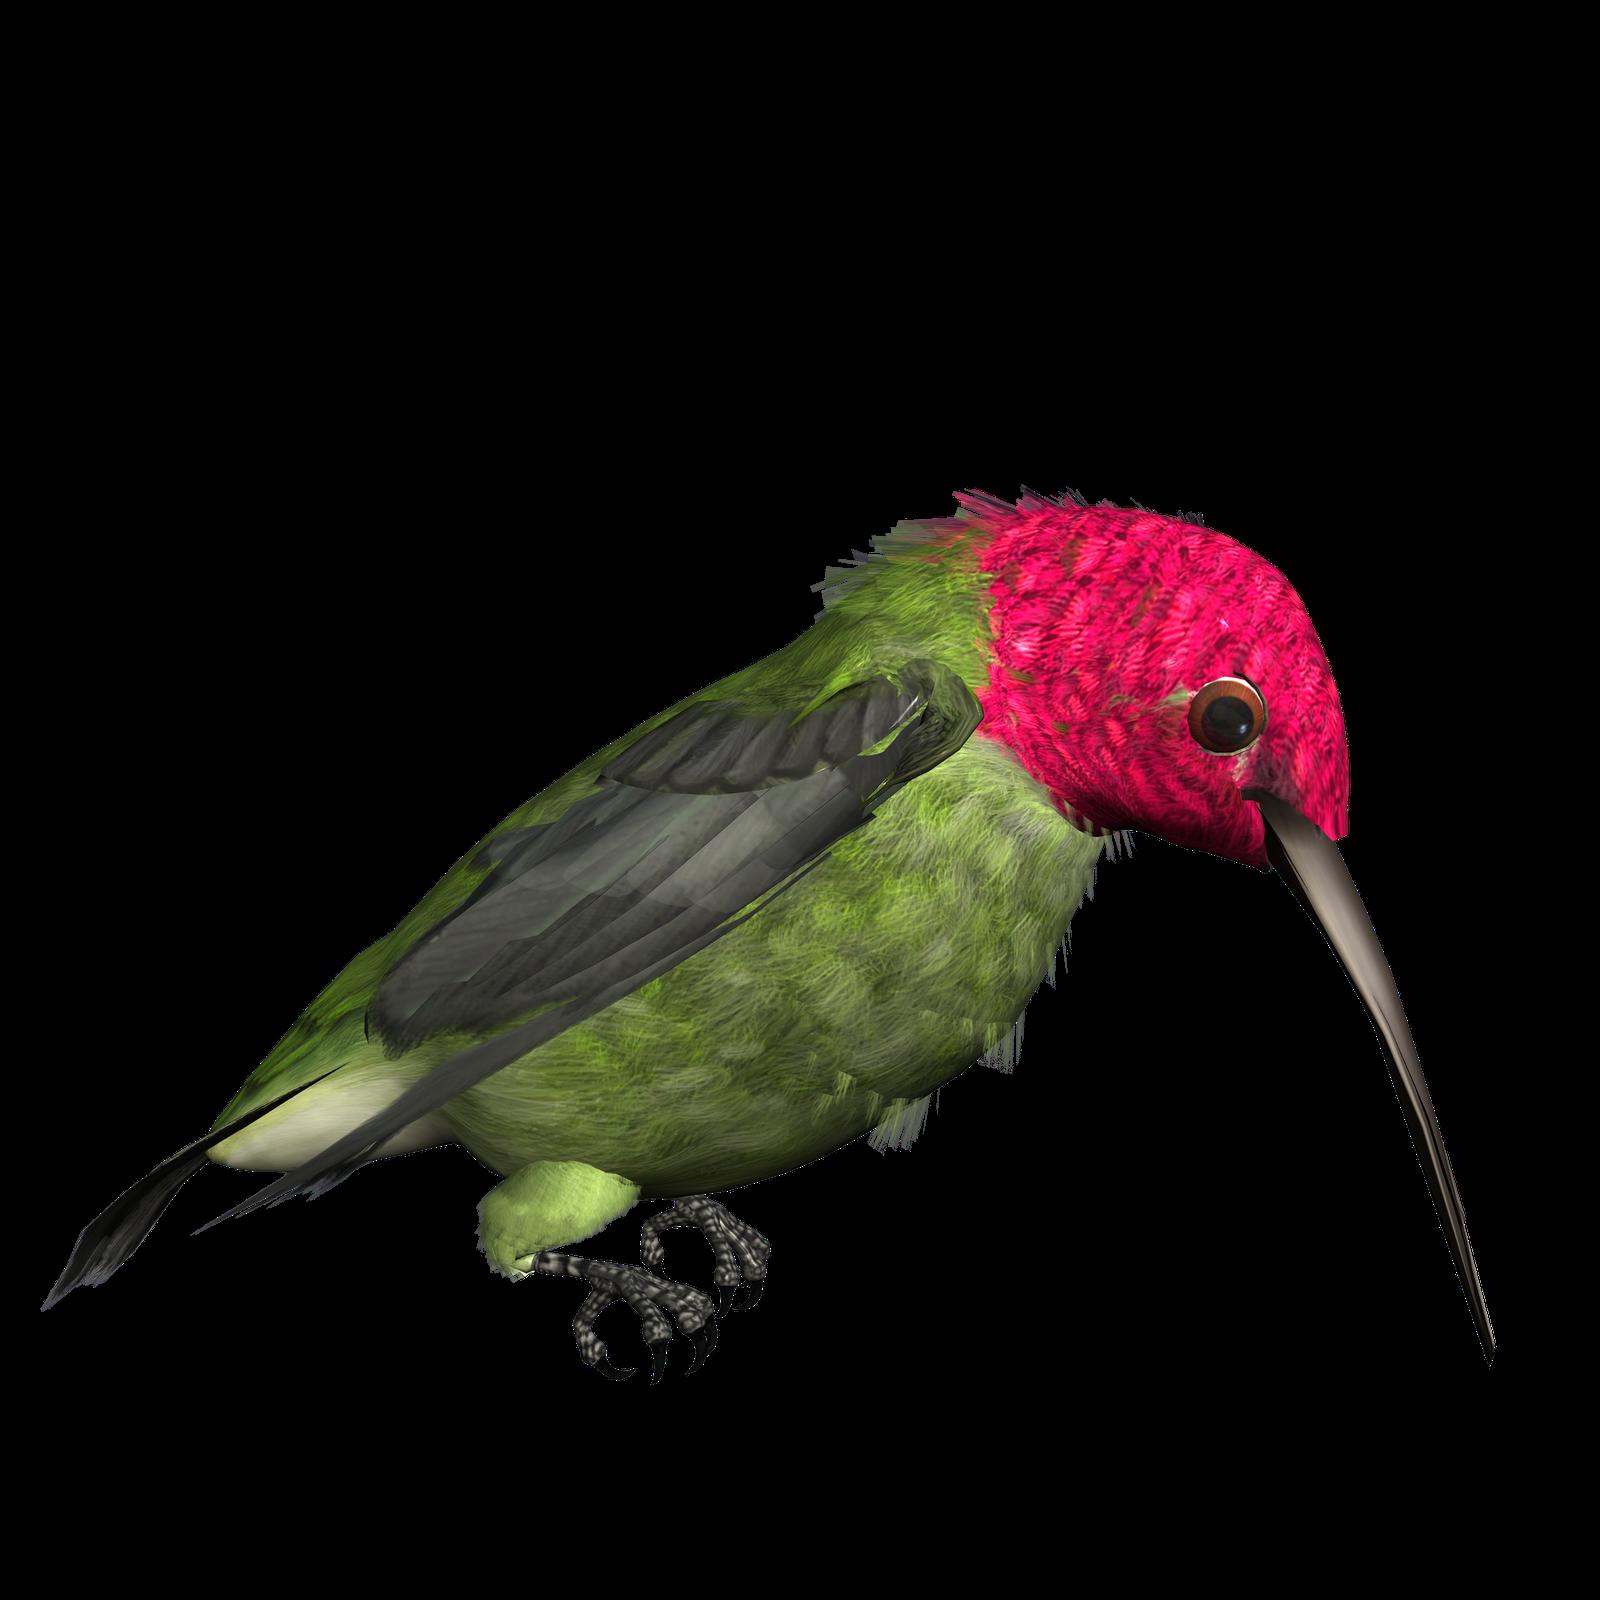 free png Hummingbird Clipart images transparent